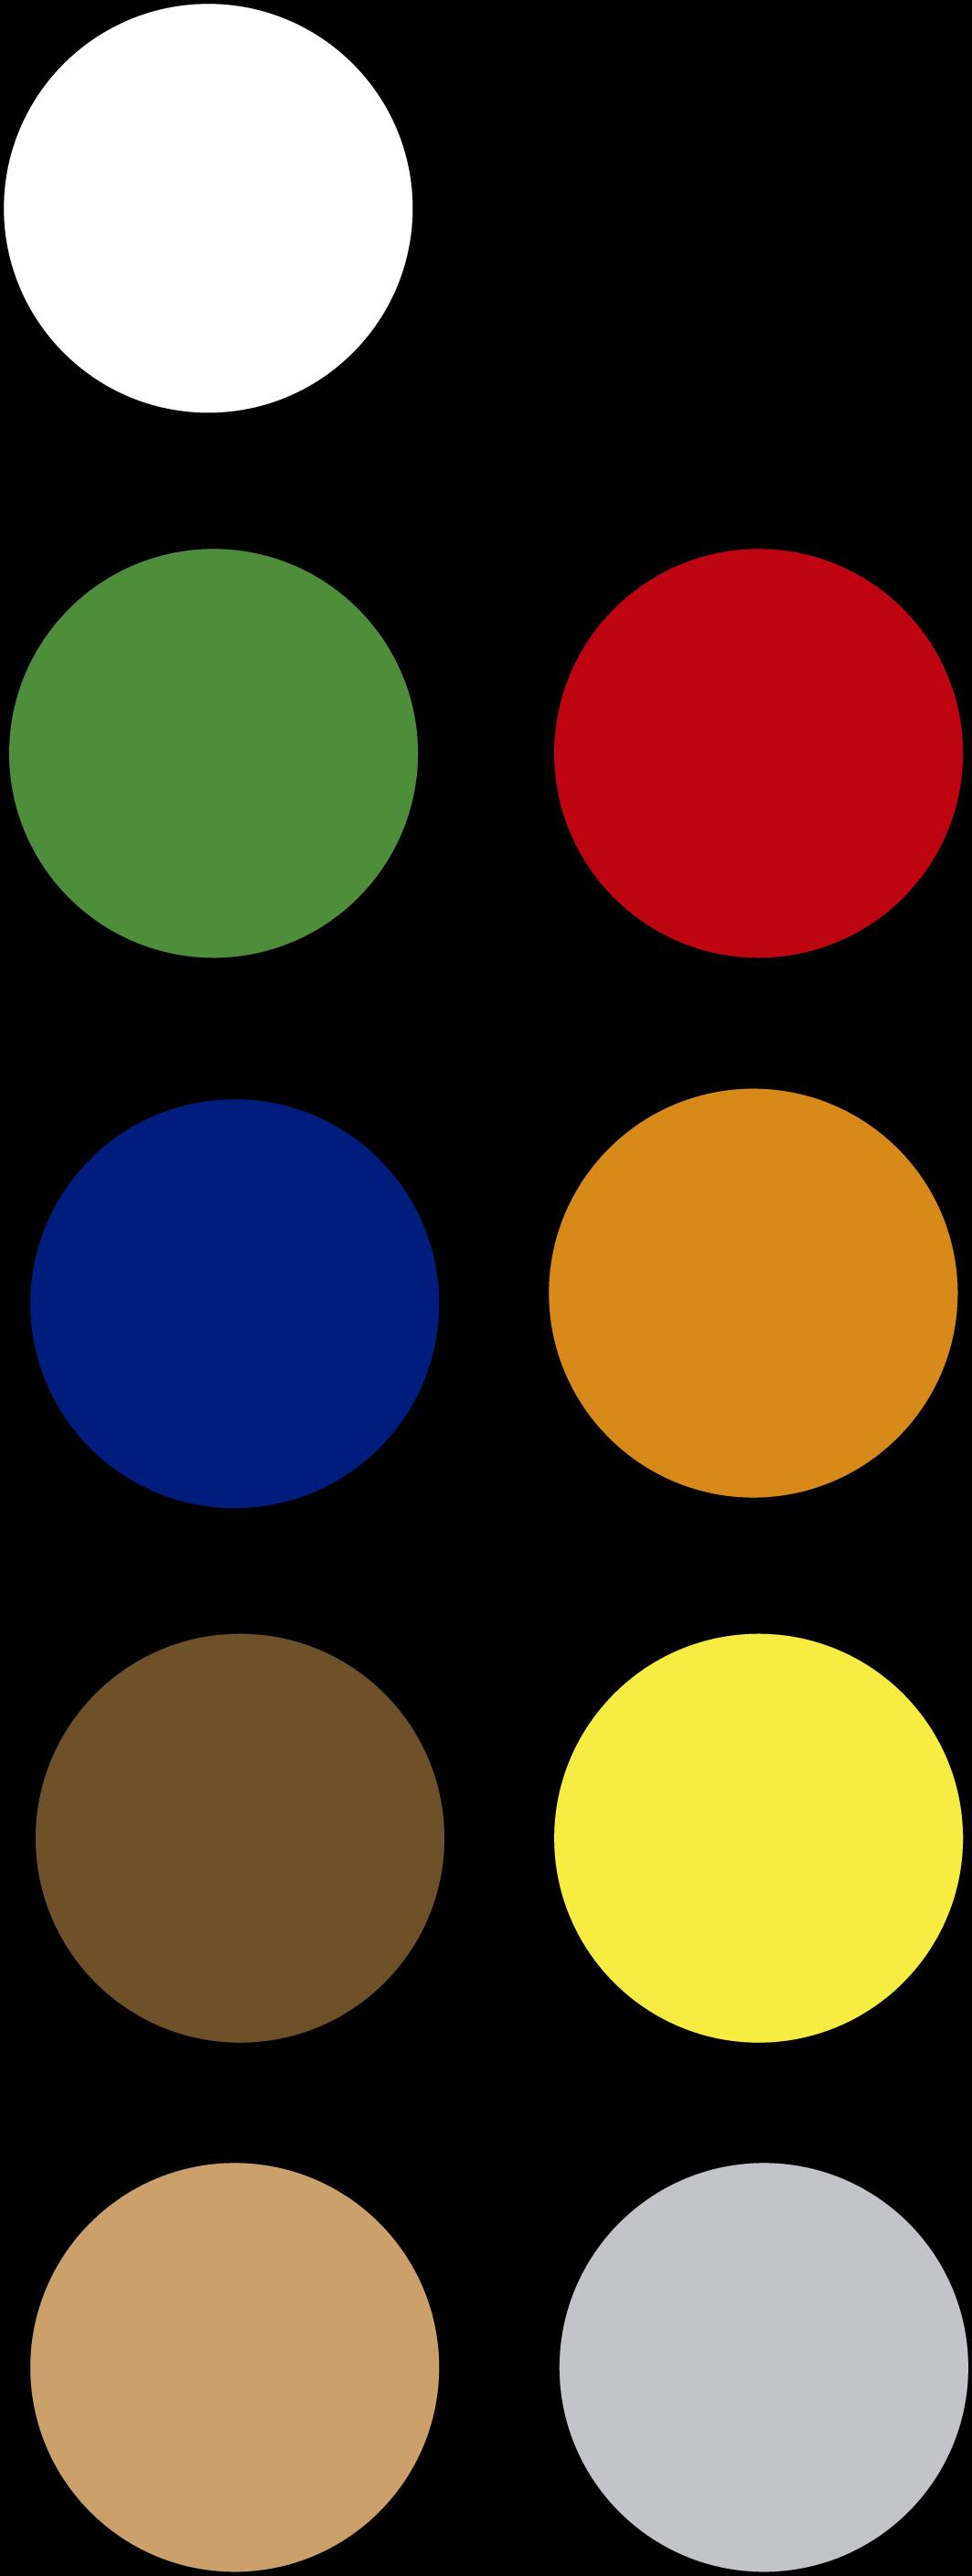 Paleta de colores - Caleta Tumbes